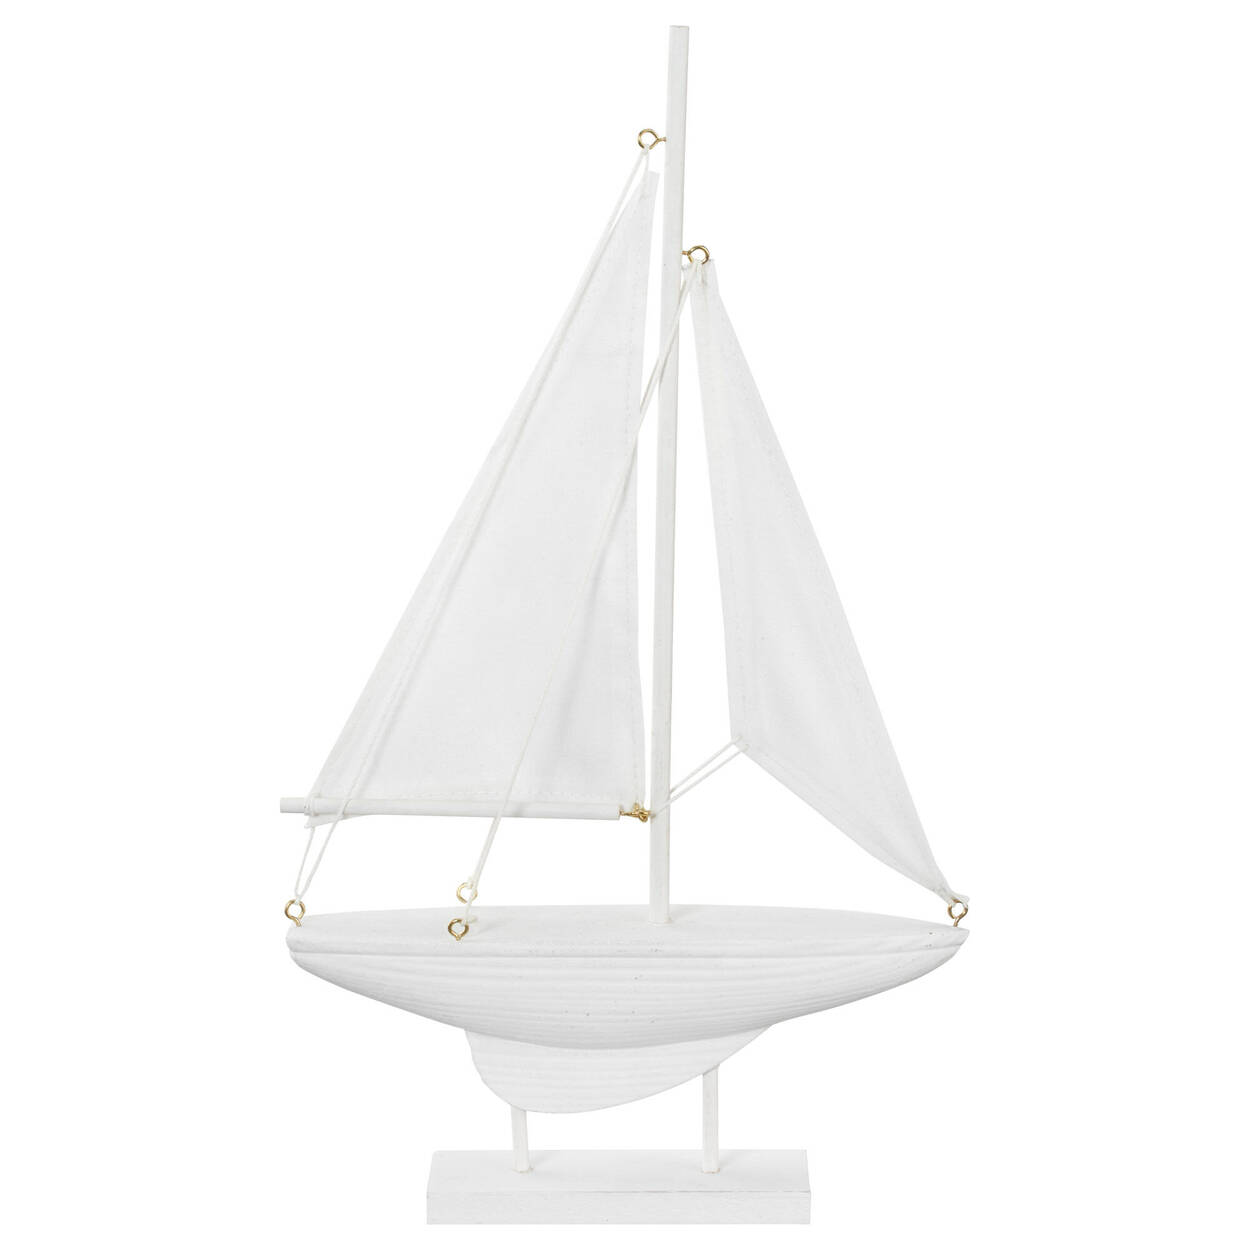 Decorative Sailboat